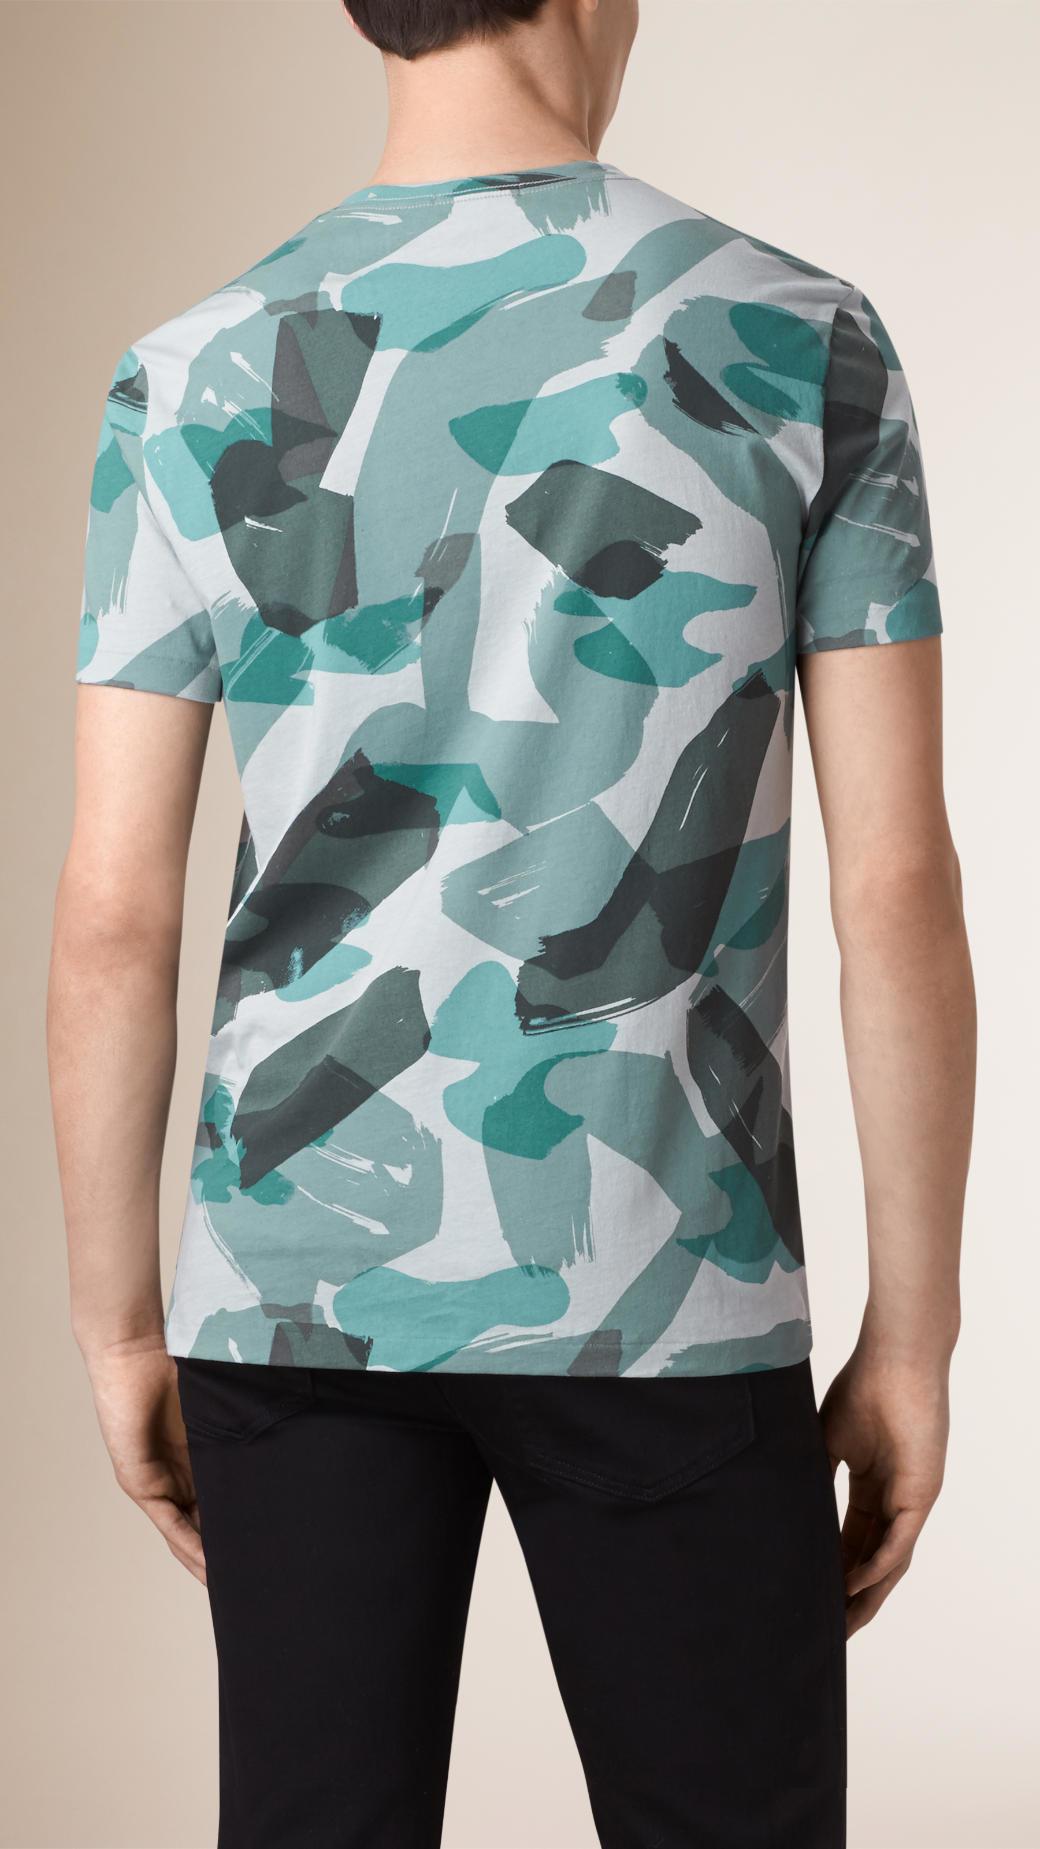 Burberry Shirts Cheap Best and Popular Shirt 2017